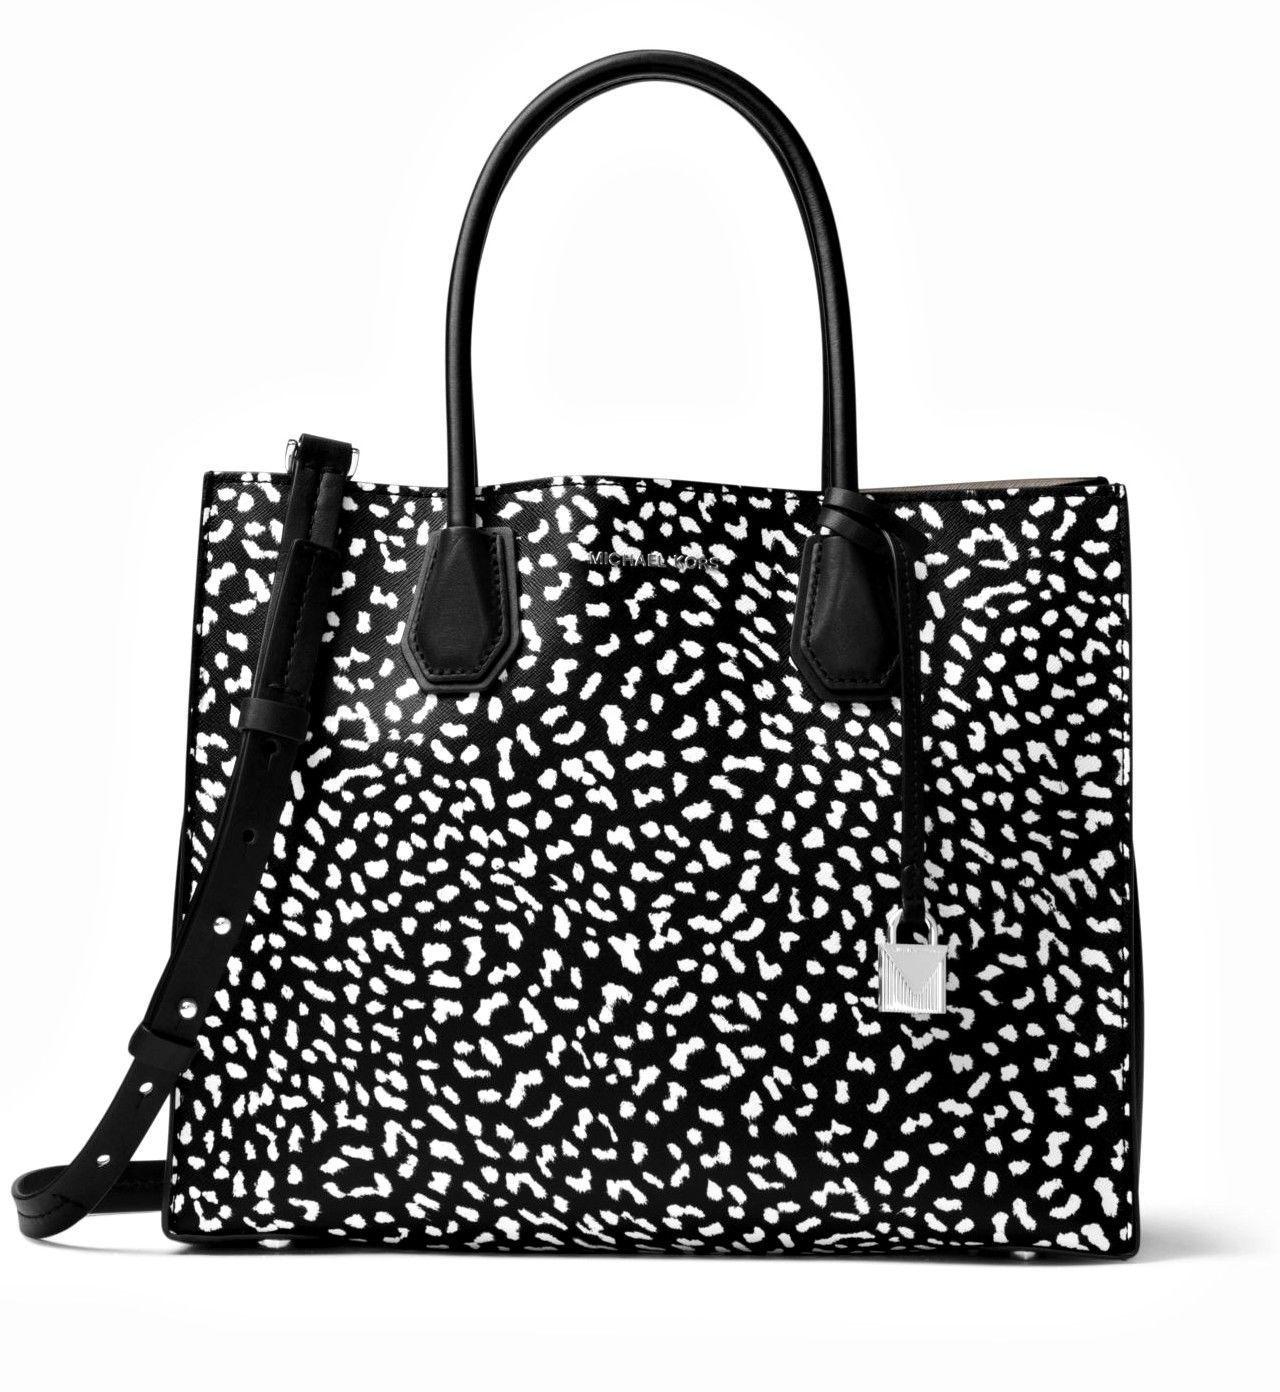 bdbbc822d314 Michael Kors Mercer Medium Messenger Purse - Black & Multicolor Star Design  Purse with Star Burst Rainbow Colorful Star Cutout MK Tote Bag | Baggage.